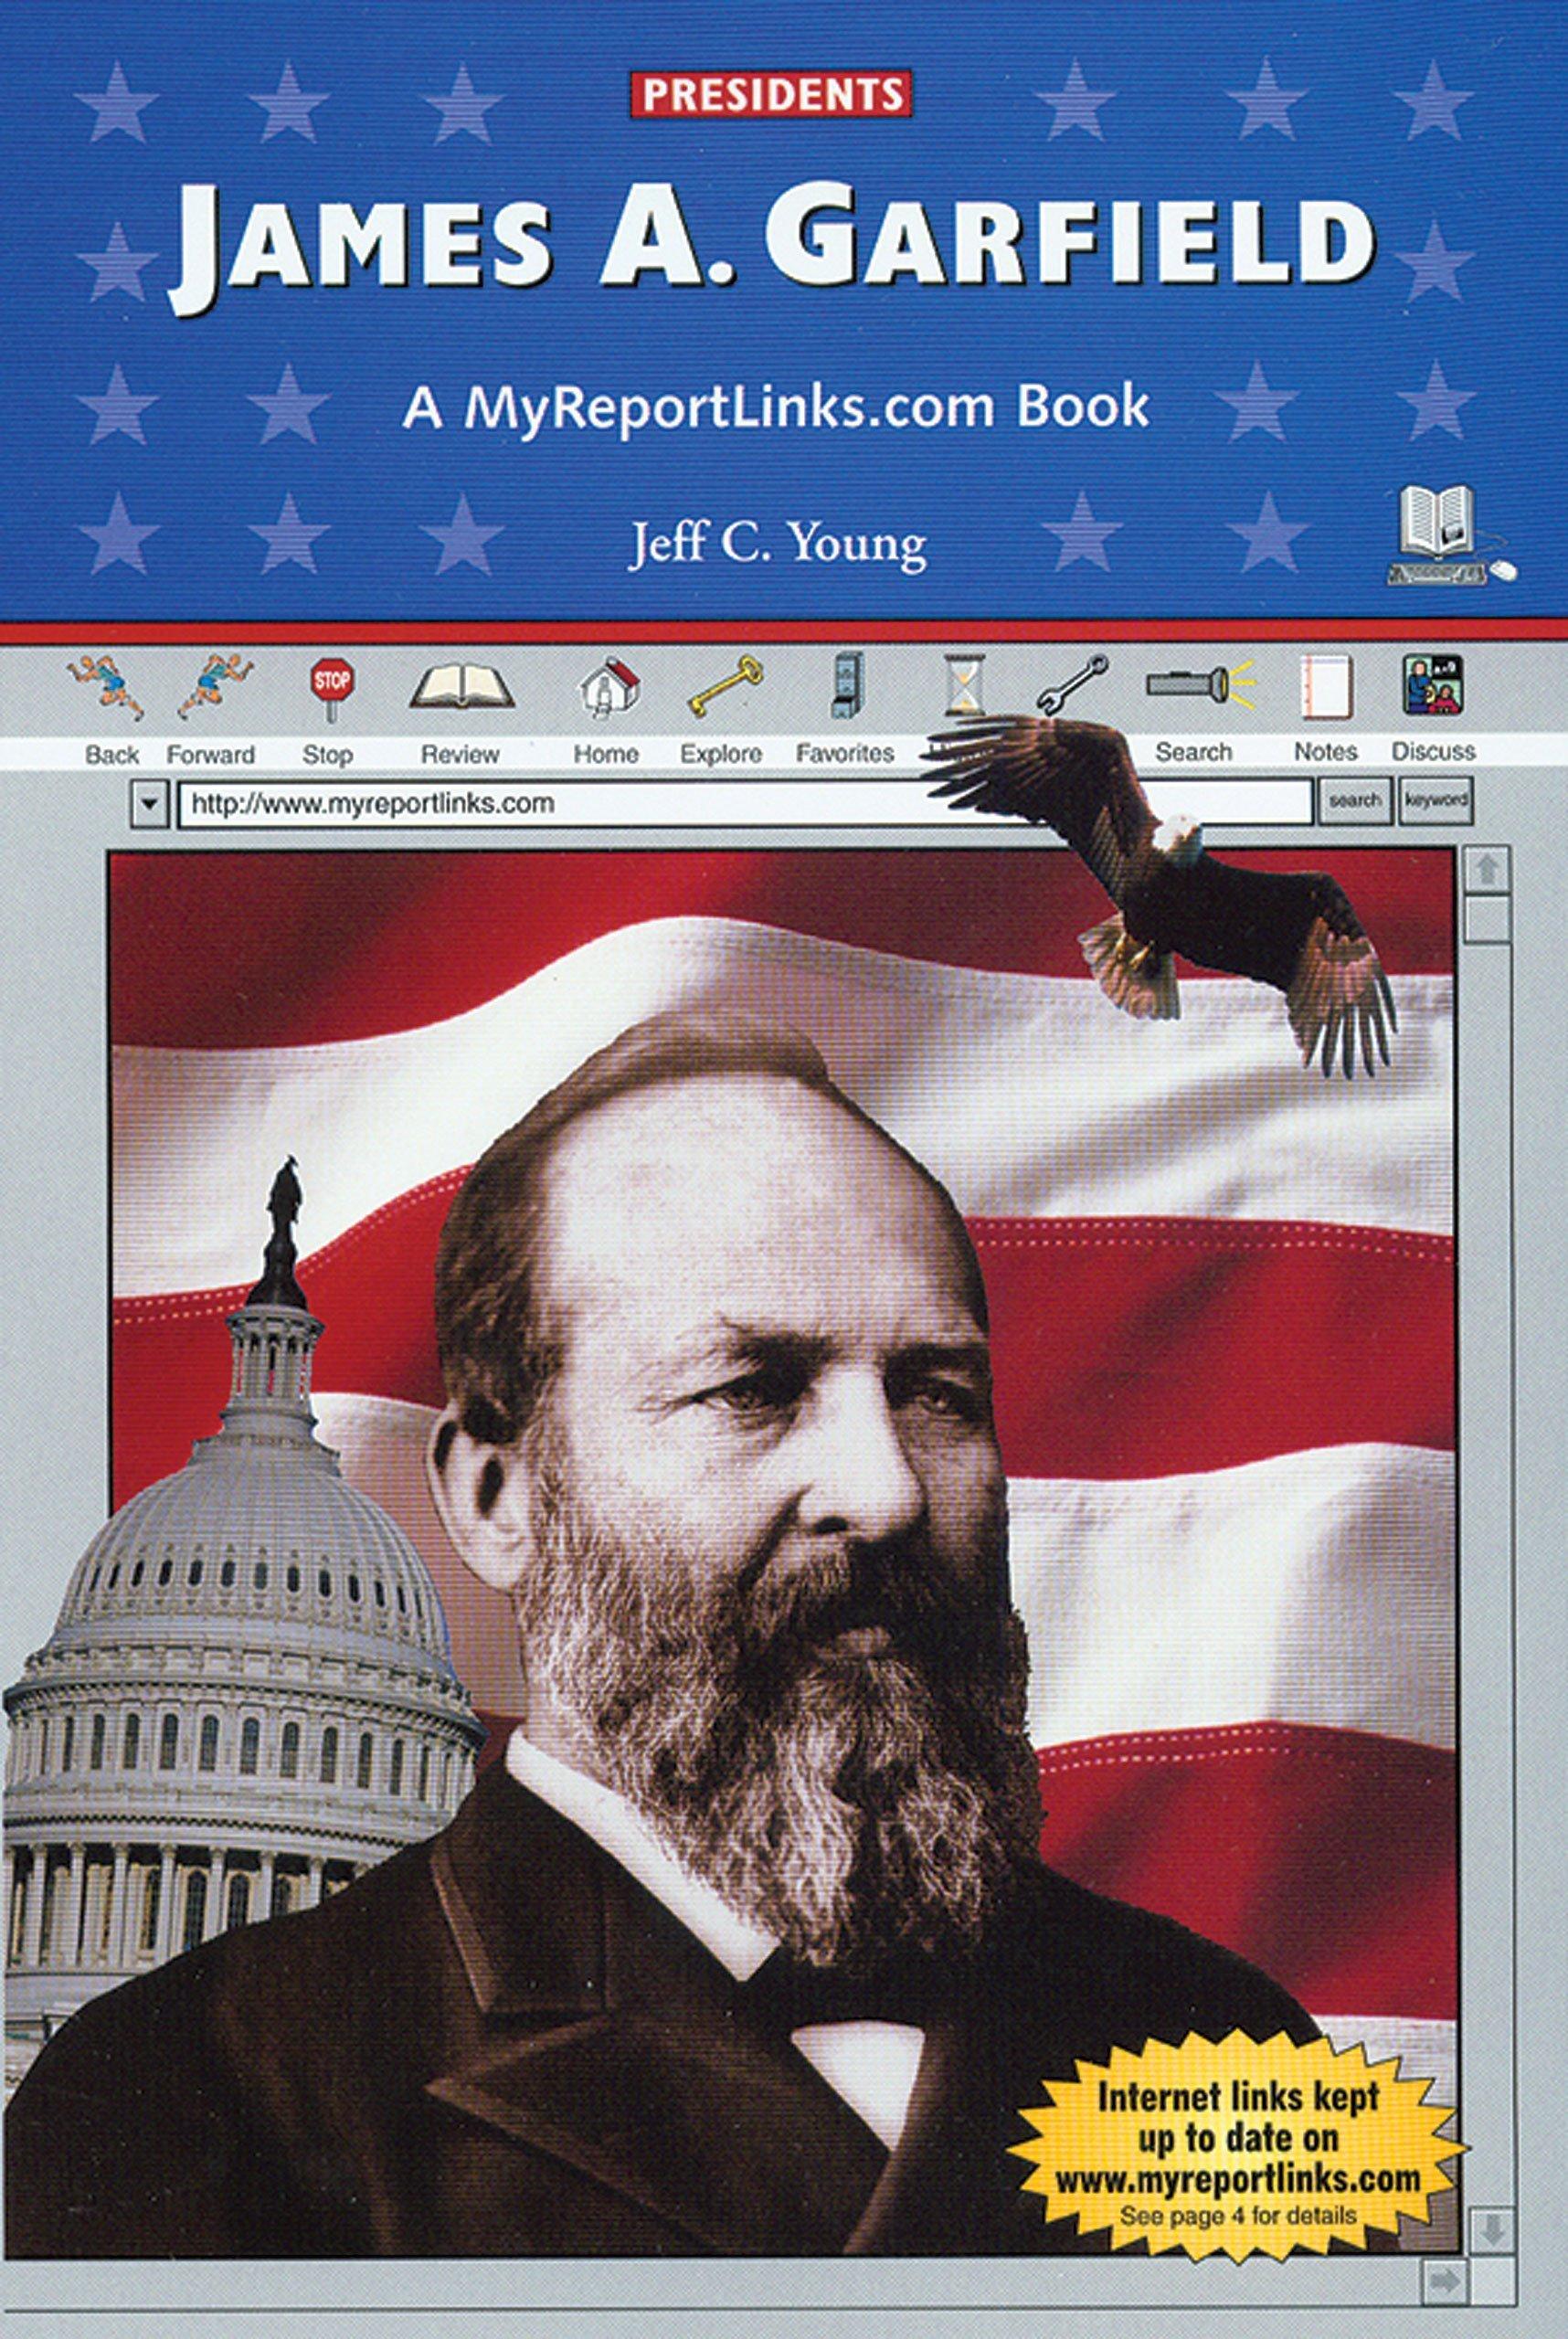 Download James A. Garfield: A MyReportLinks.com Book (Presidents) ebook